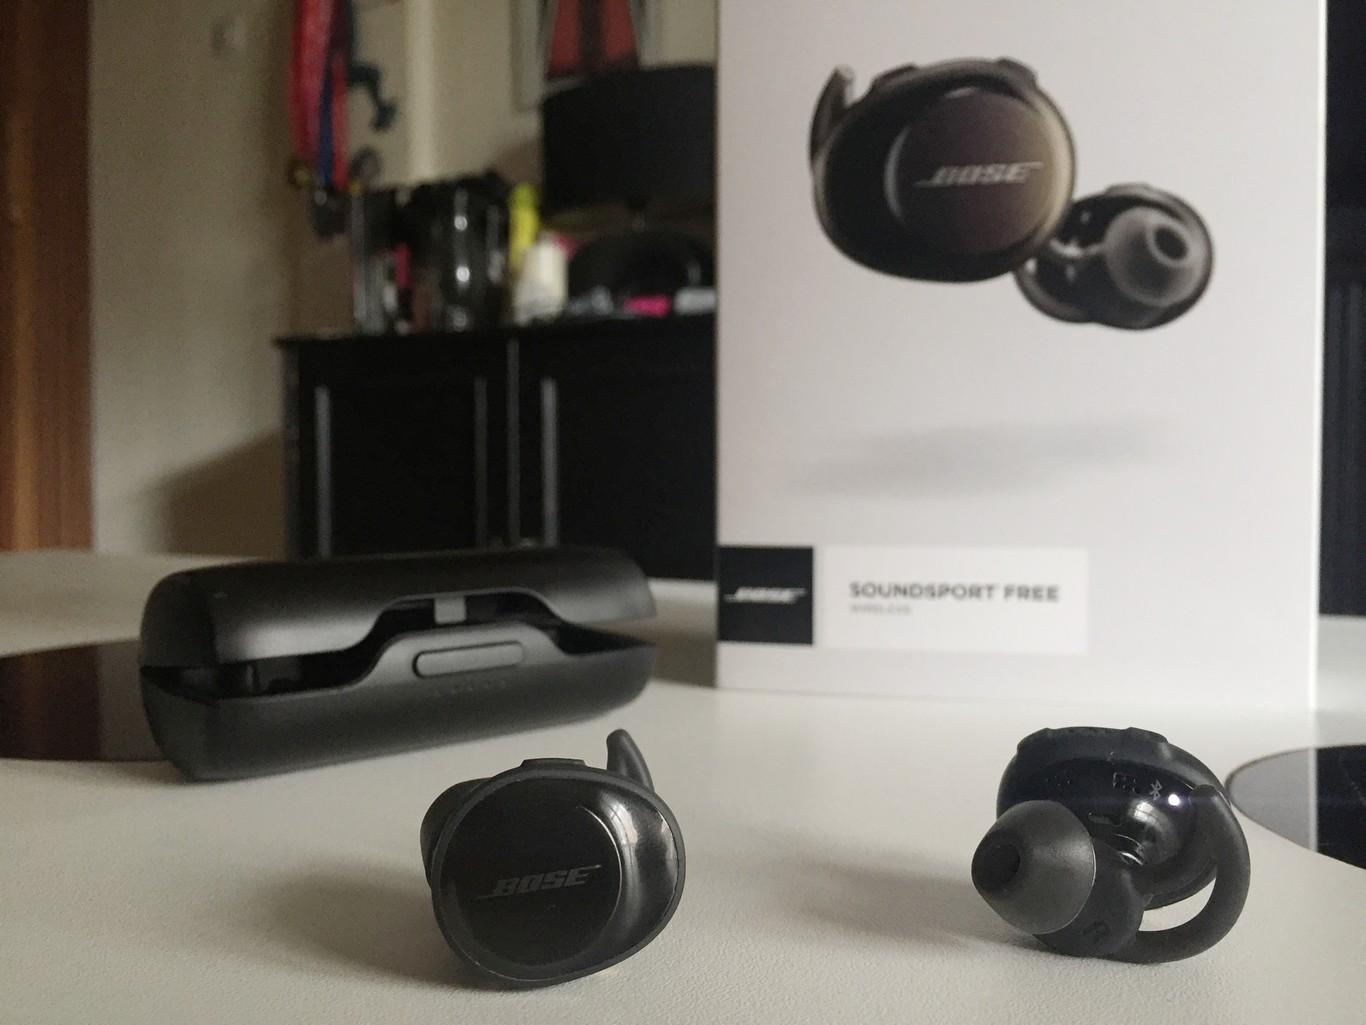 ab678e543de SoundSport Free de Bose: análisis de los auriculares inalámbricos para  deporte